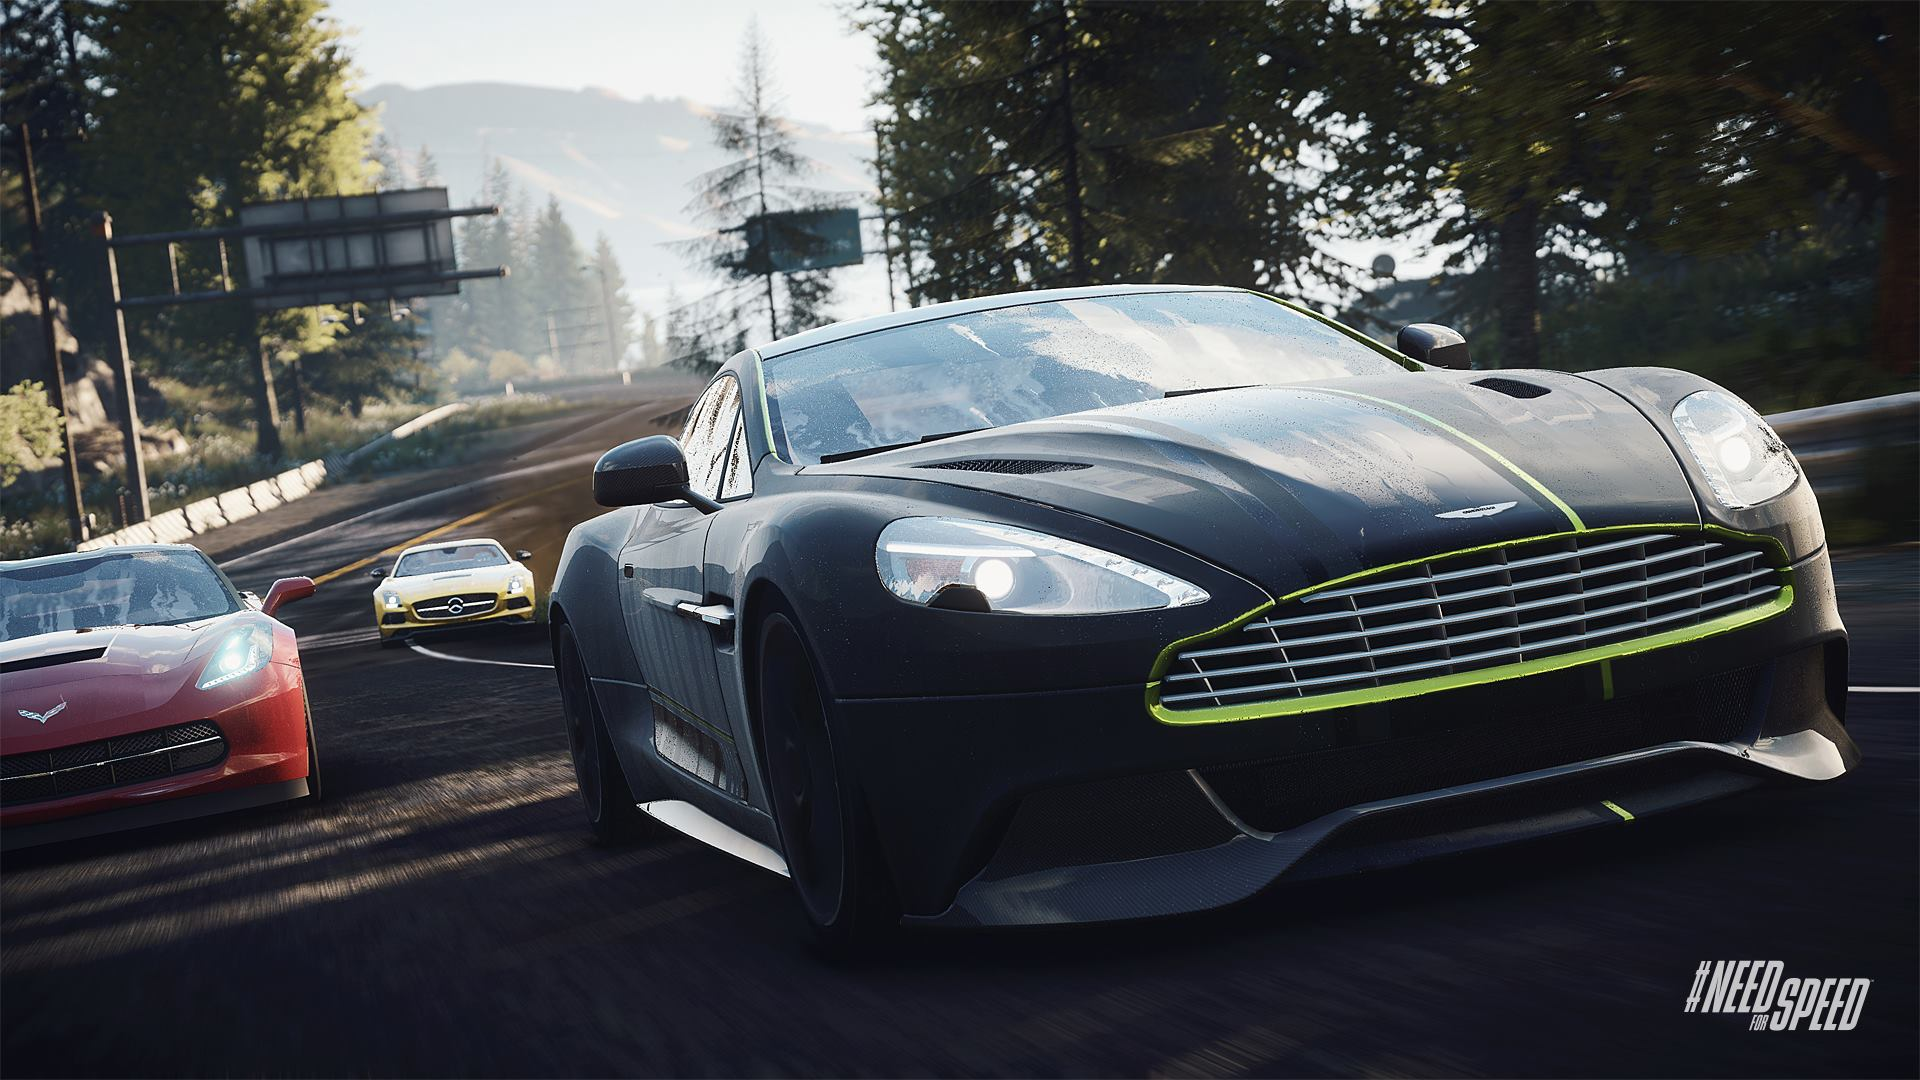 Aston Martin Vanquish 2012 Need For Speed Wiki Fandom